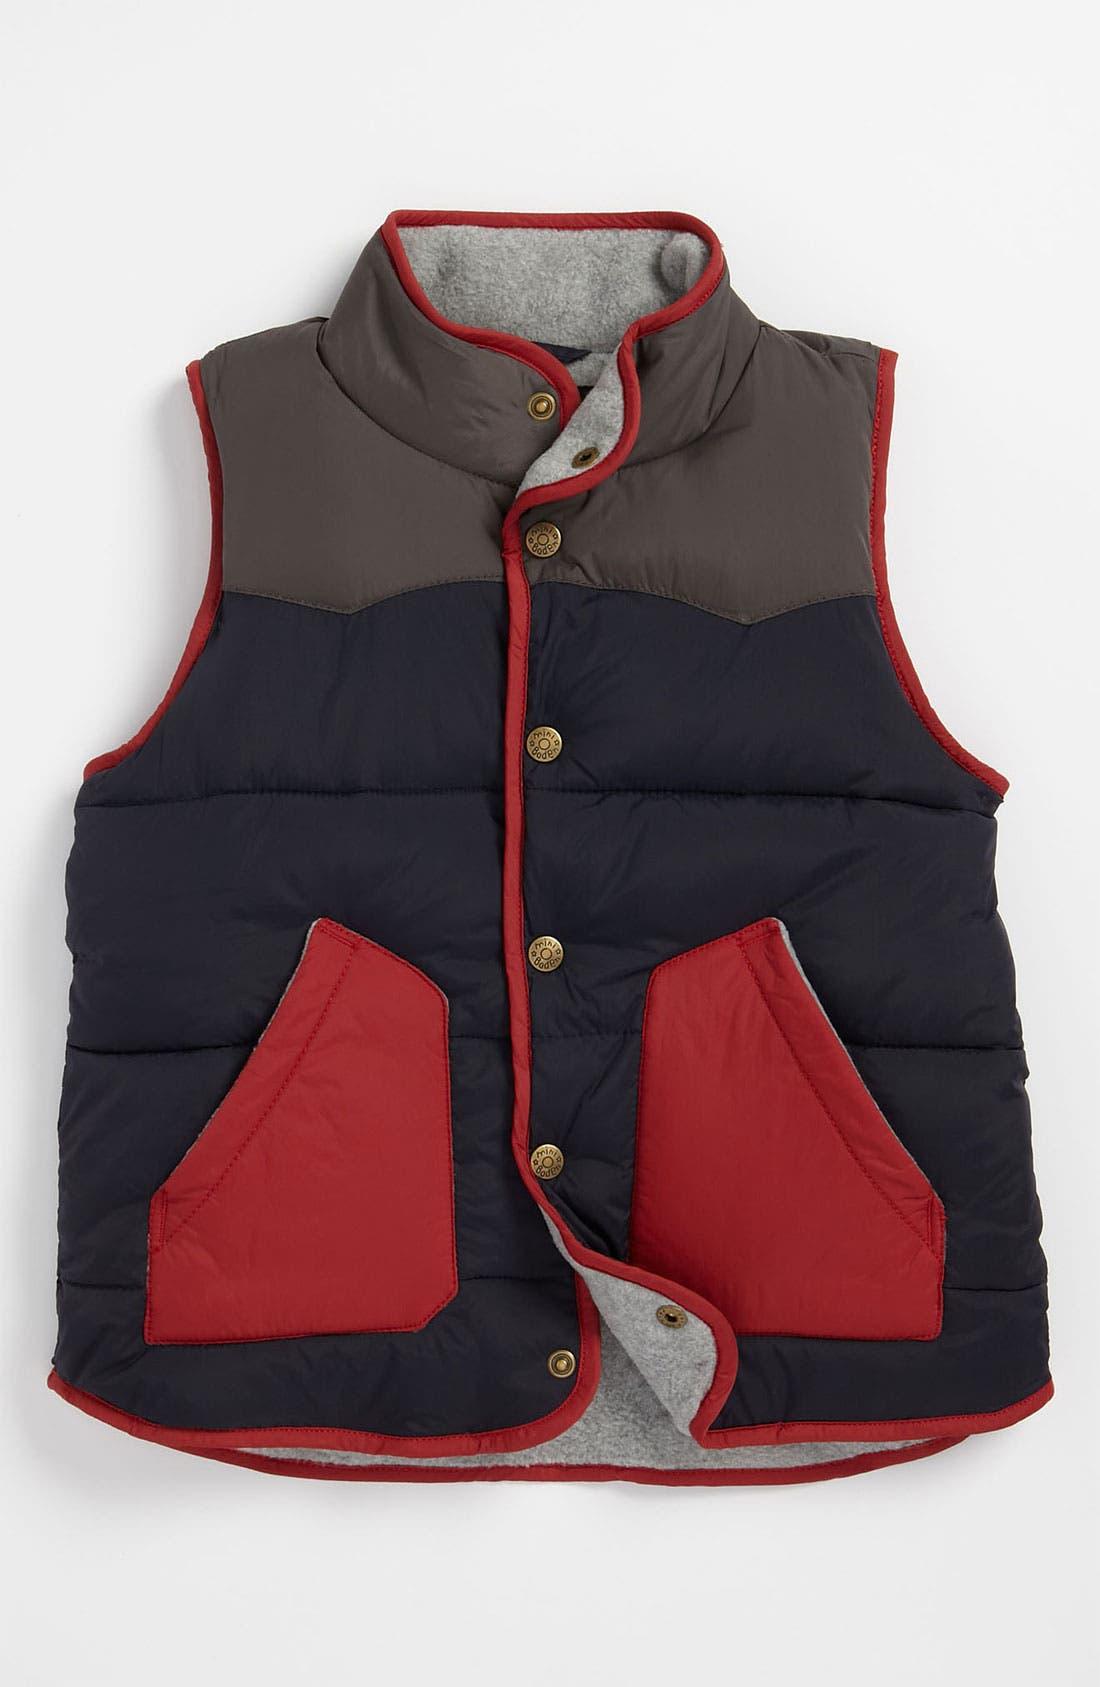 Alternate Image 1 Selected - Mini Boden Colorblock Vest (Toddler)